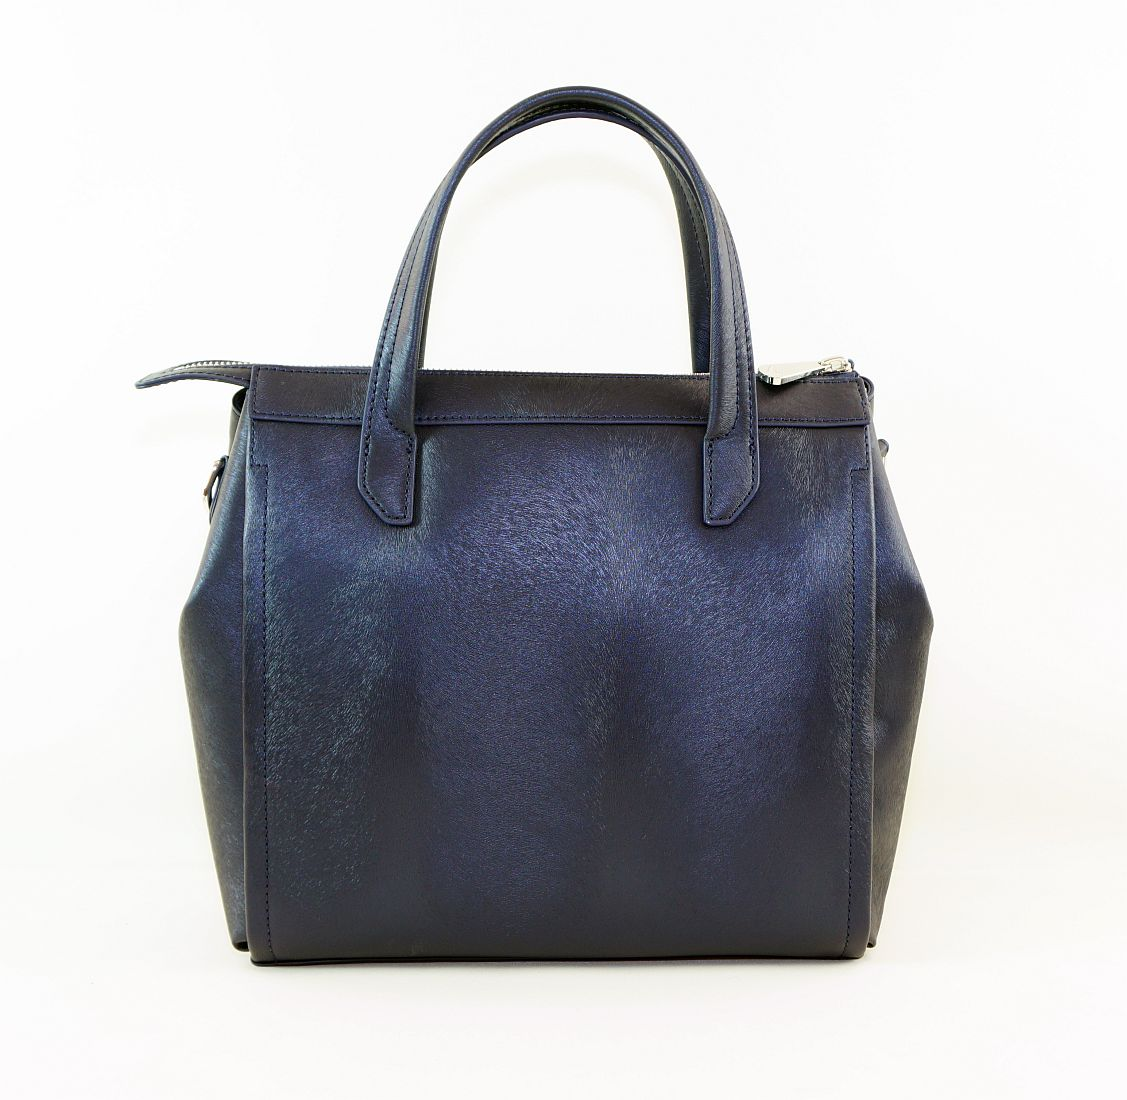 Armani Jeans Handtasche Shopper Tasche WOMEN'S TOP HANDLE B 922103 6A728 31735 Patriot Blue HW16-1